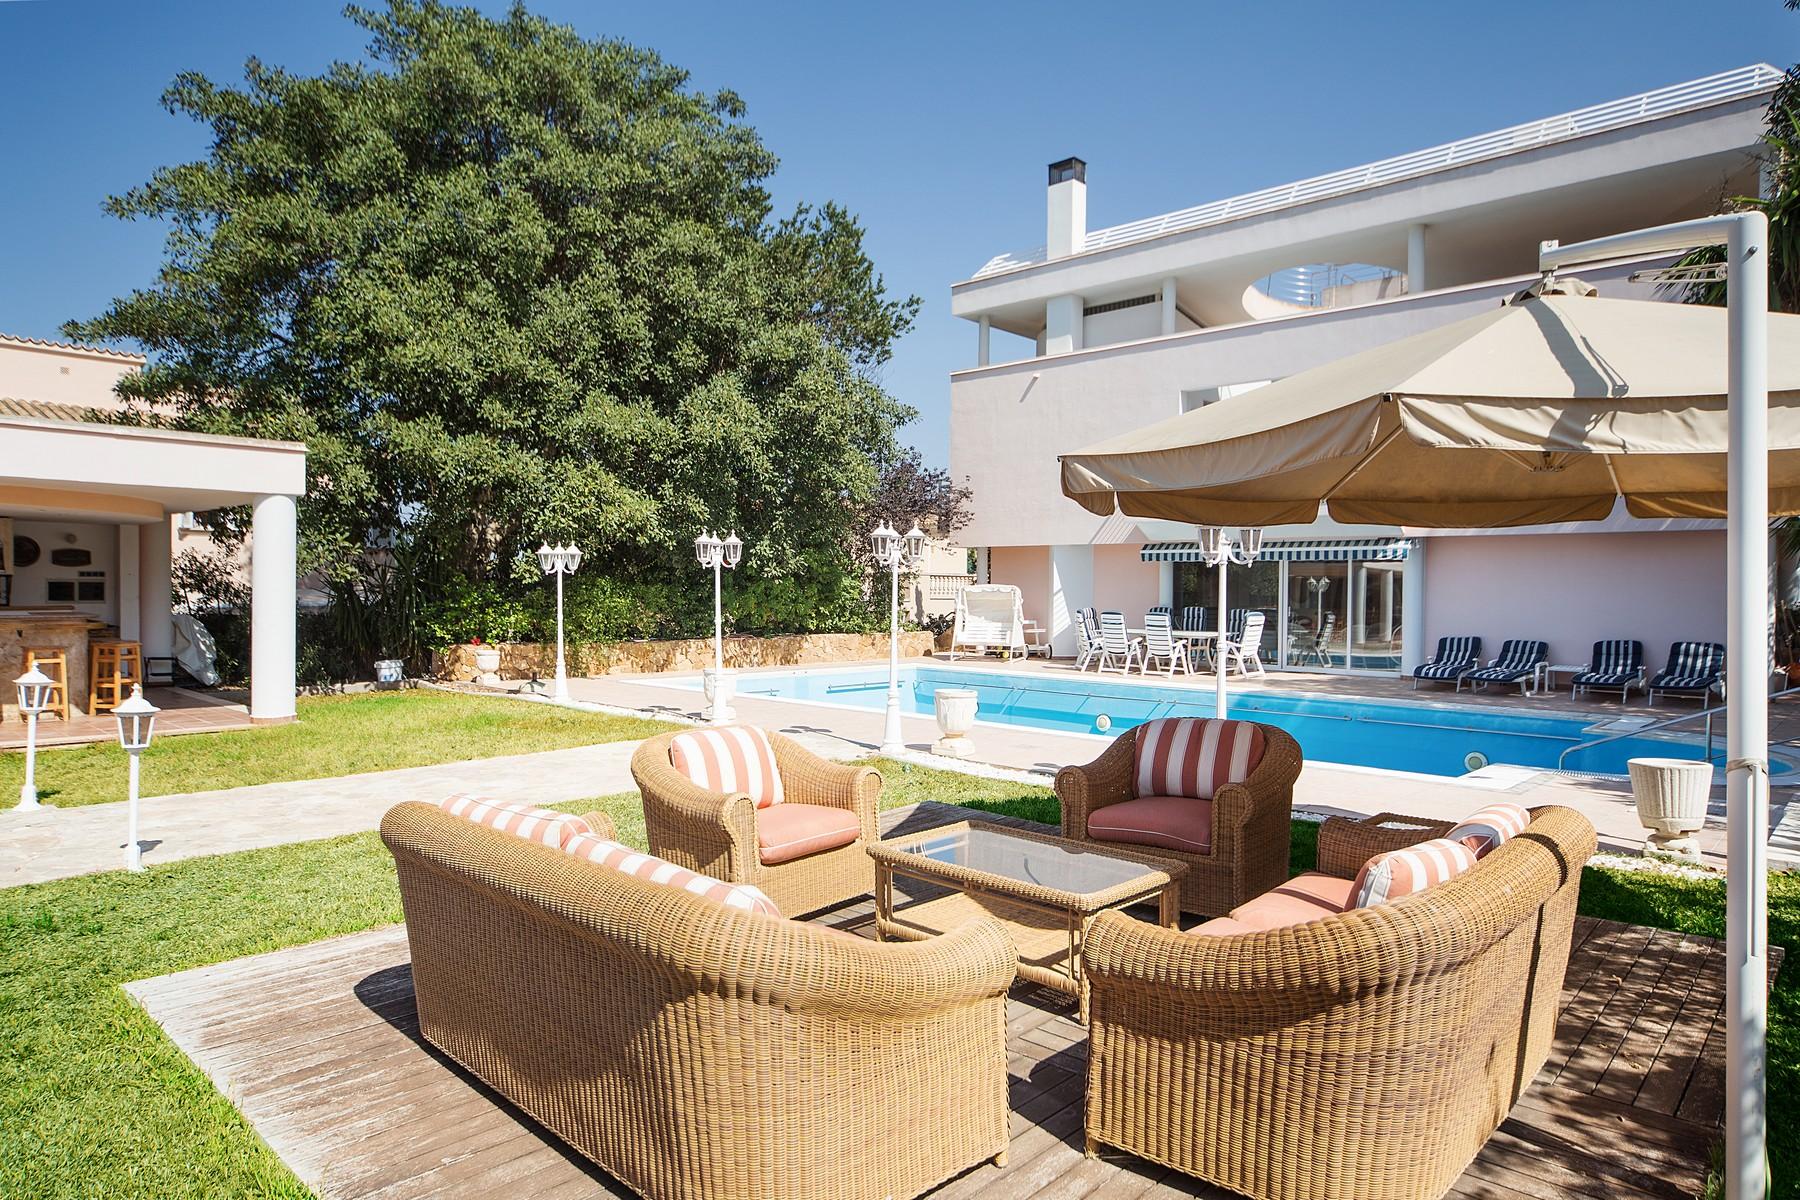 Single Family Home for Sale at Stunning villa in Son Verí Palma De Mallorca, Balearic Islands, 07001 Spain